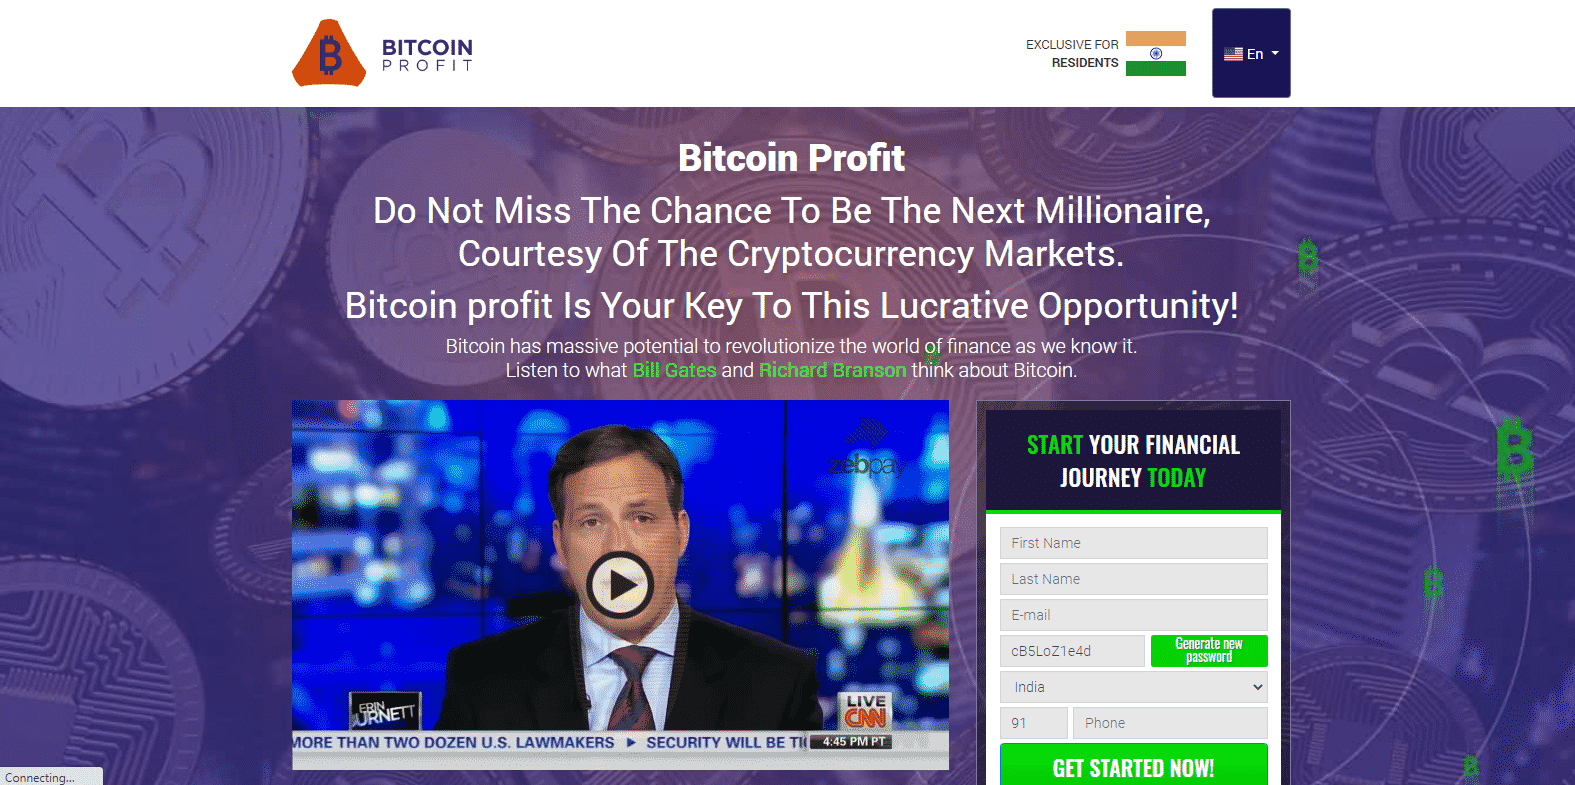 Bitcoin Profit Trading Platform